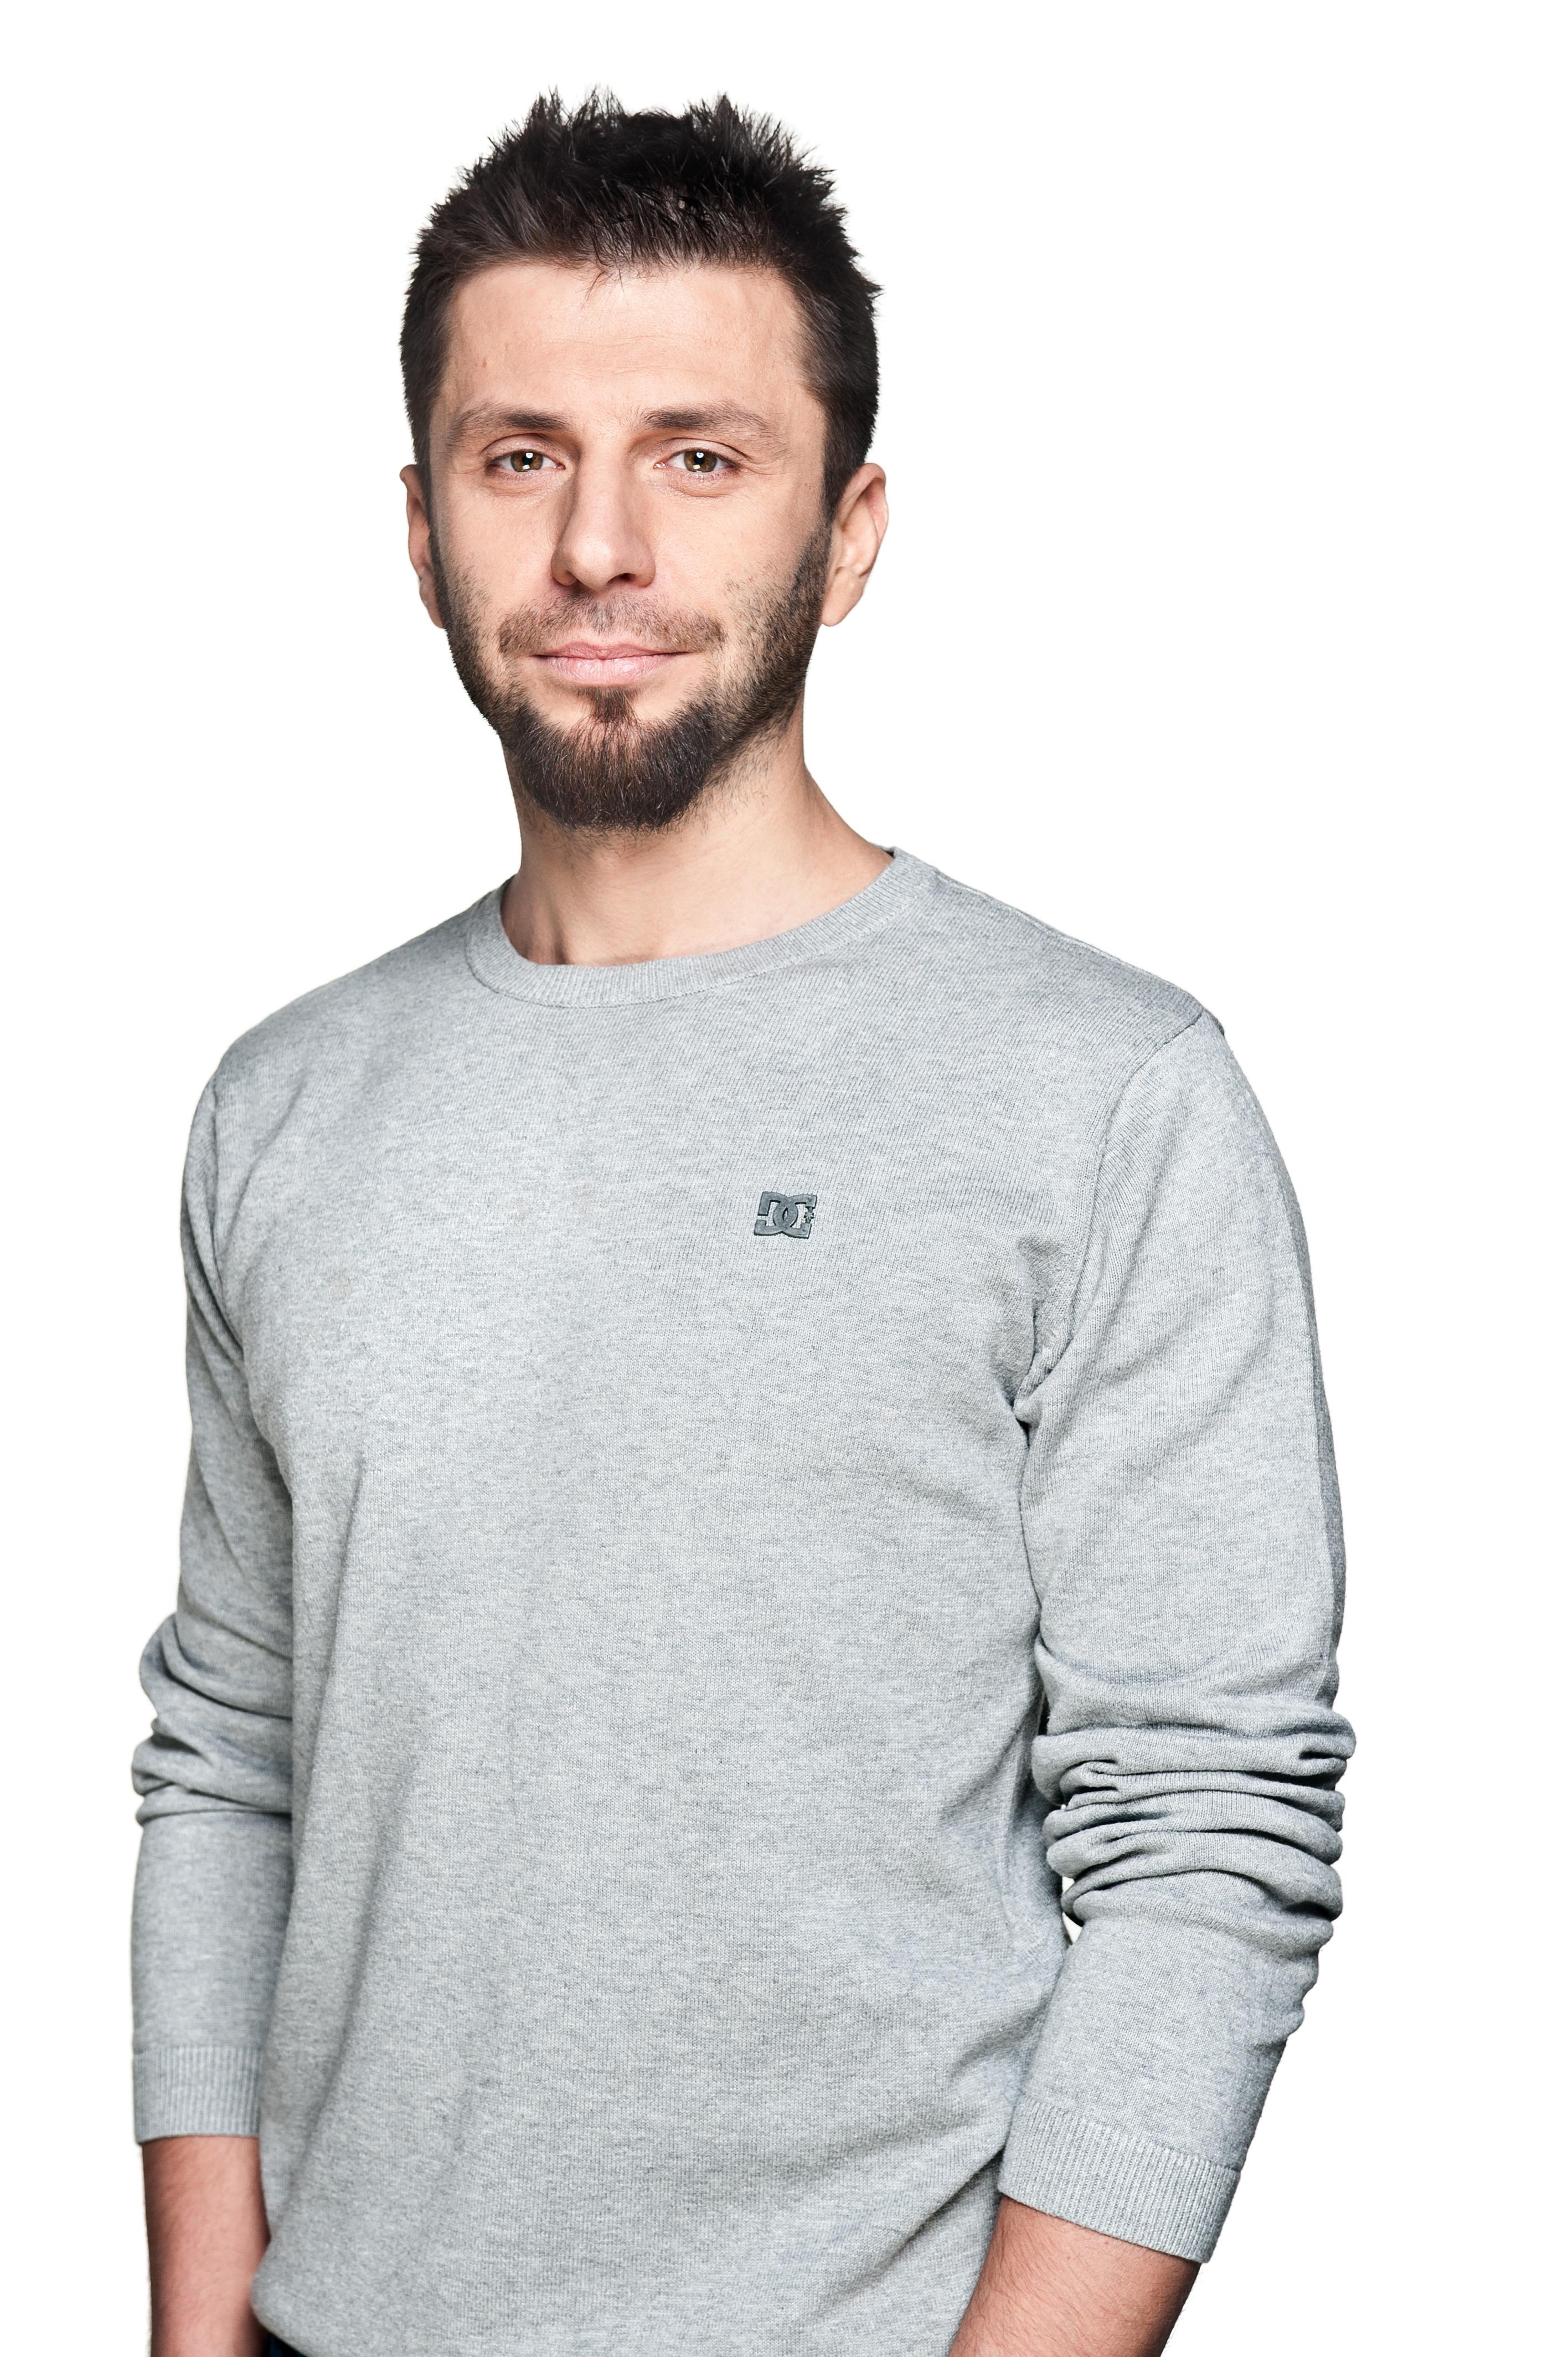 Łukasz Lewandowski k2